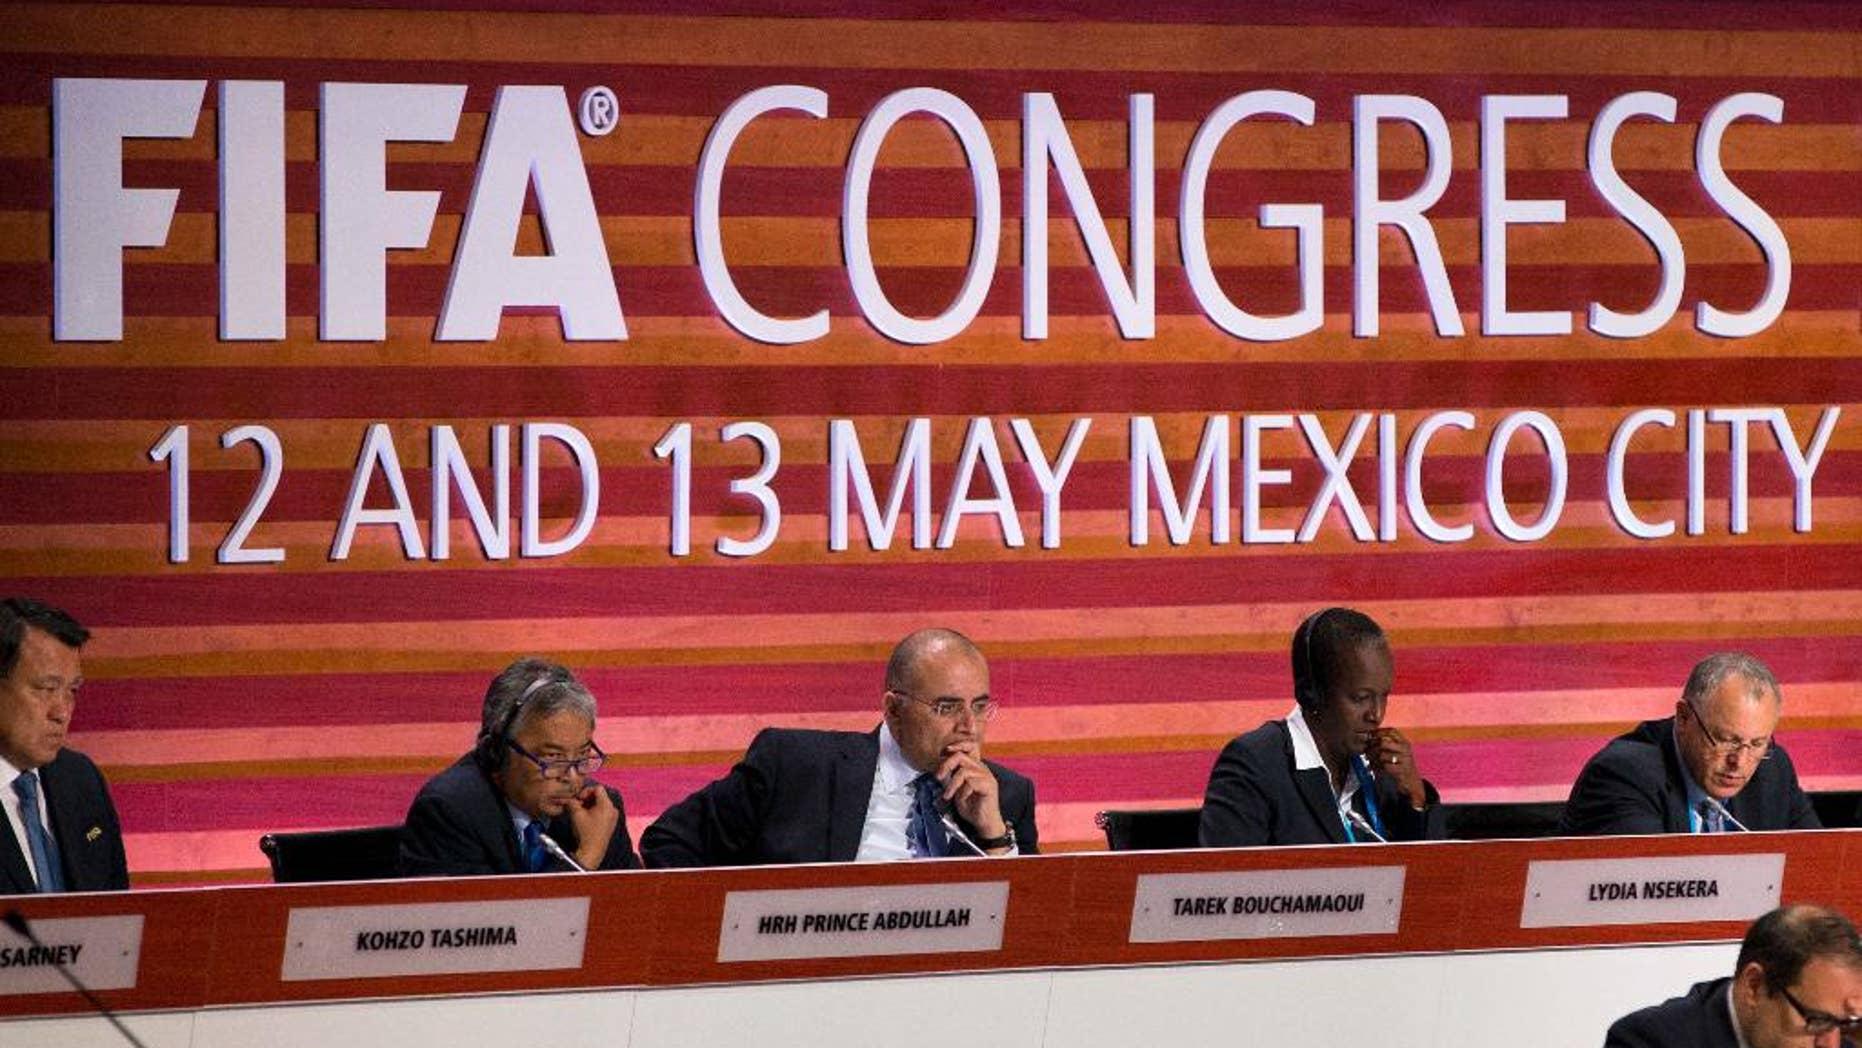 FIFA council members listen during the 66th FIFA Congress, in Mexico City, Friday, May 13, 2016. From left, are Kohzo Tashima of Japan, Prince Abdullah of Malaysia, Tarek Bouchamaoui of Tunisia, Lydia Nsekera of Burundi, and Hany Abo Rida of Egypt. (AP Photo/Rebecca Blackwell)